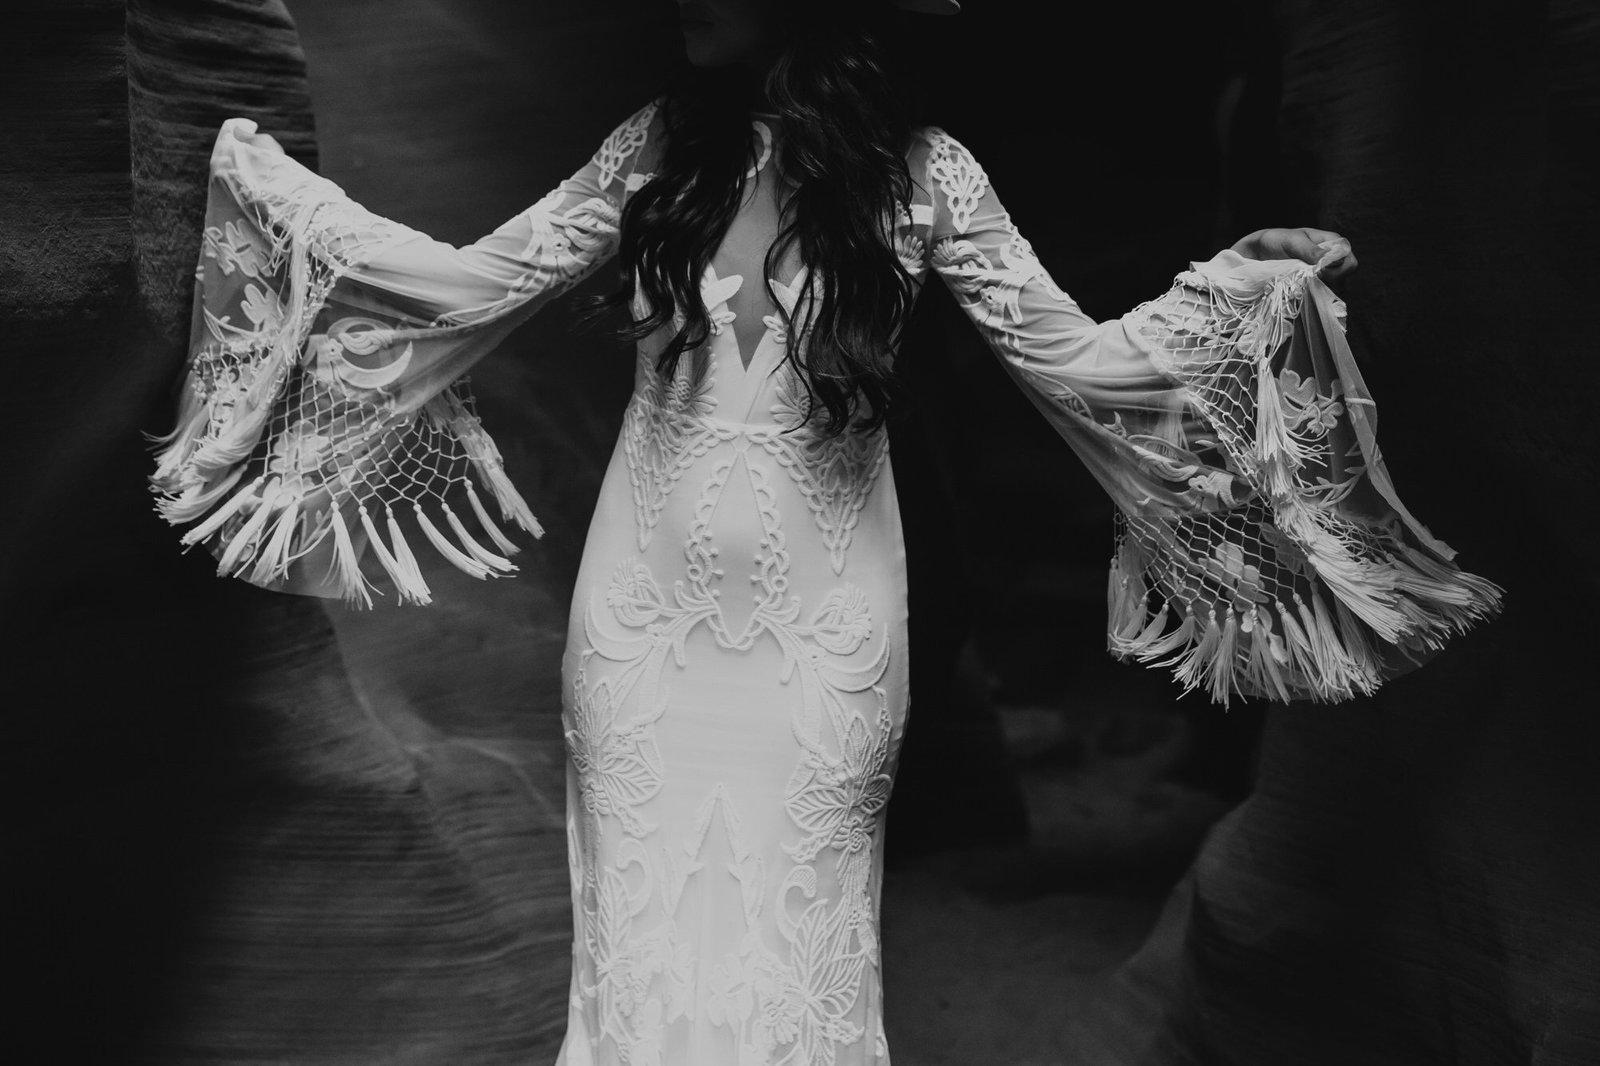 Detail shot of rue de seine wedding dress.